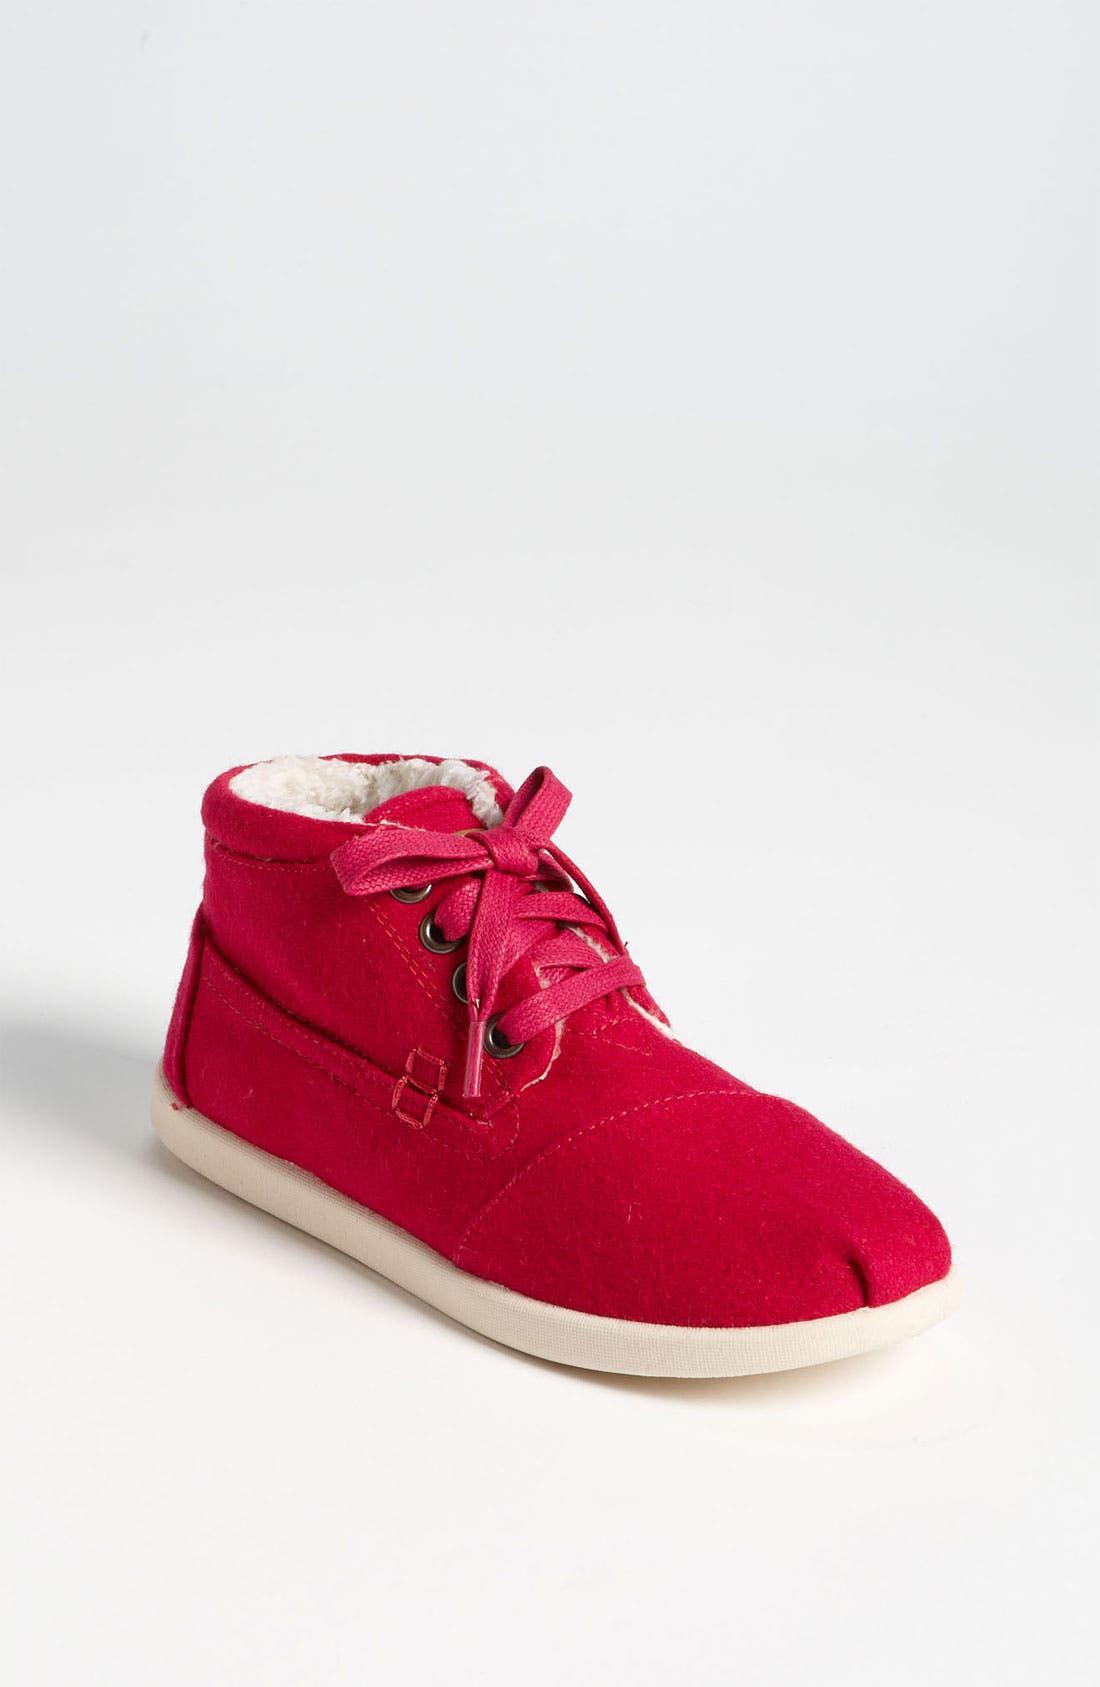 Alternate Image 1 Selected - TOMS 'Botas - Youth' Wool Boot (Toddler, Little Kid & Big Kid)